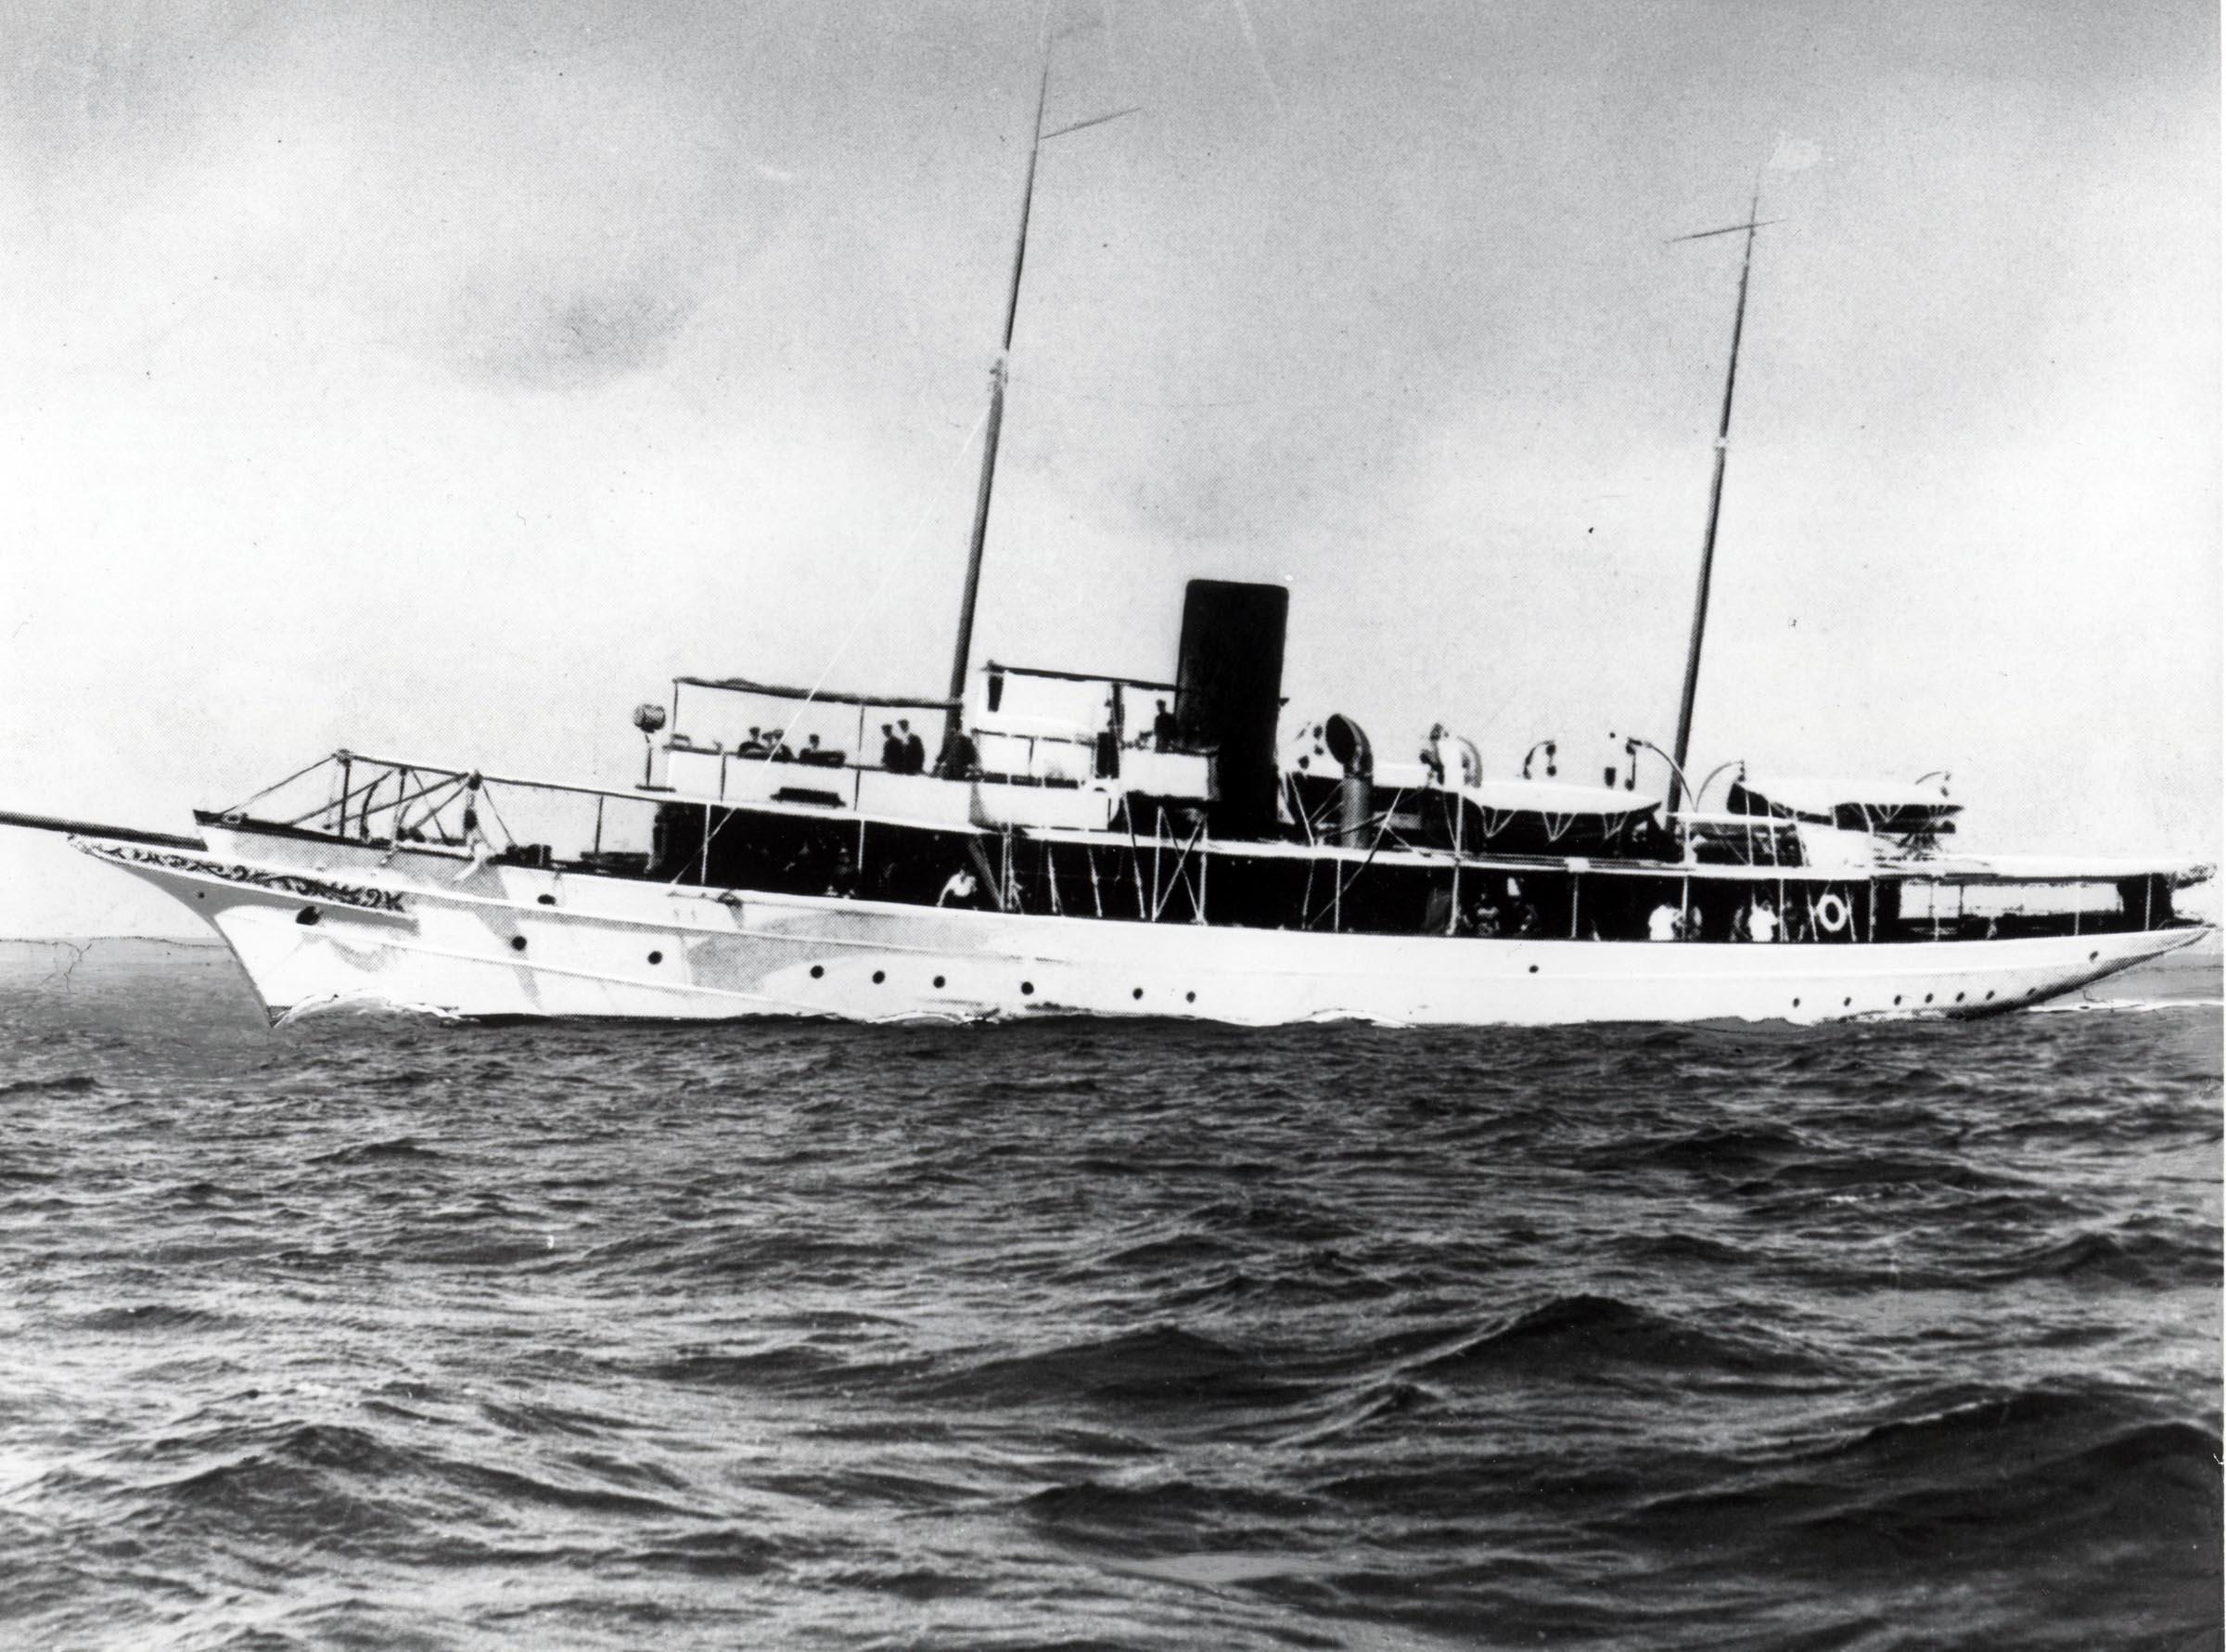 HMCS FLORENCE